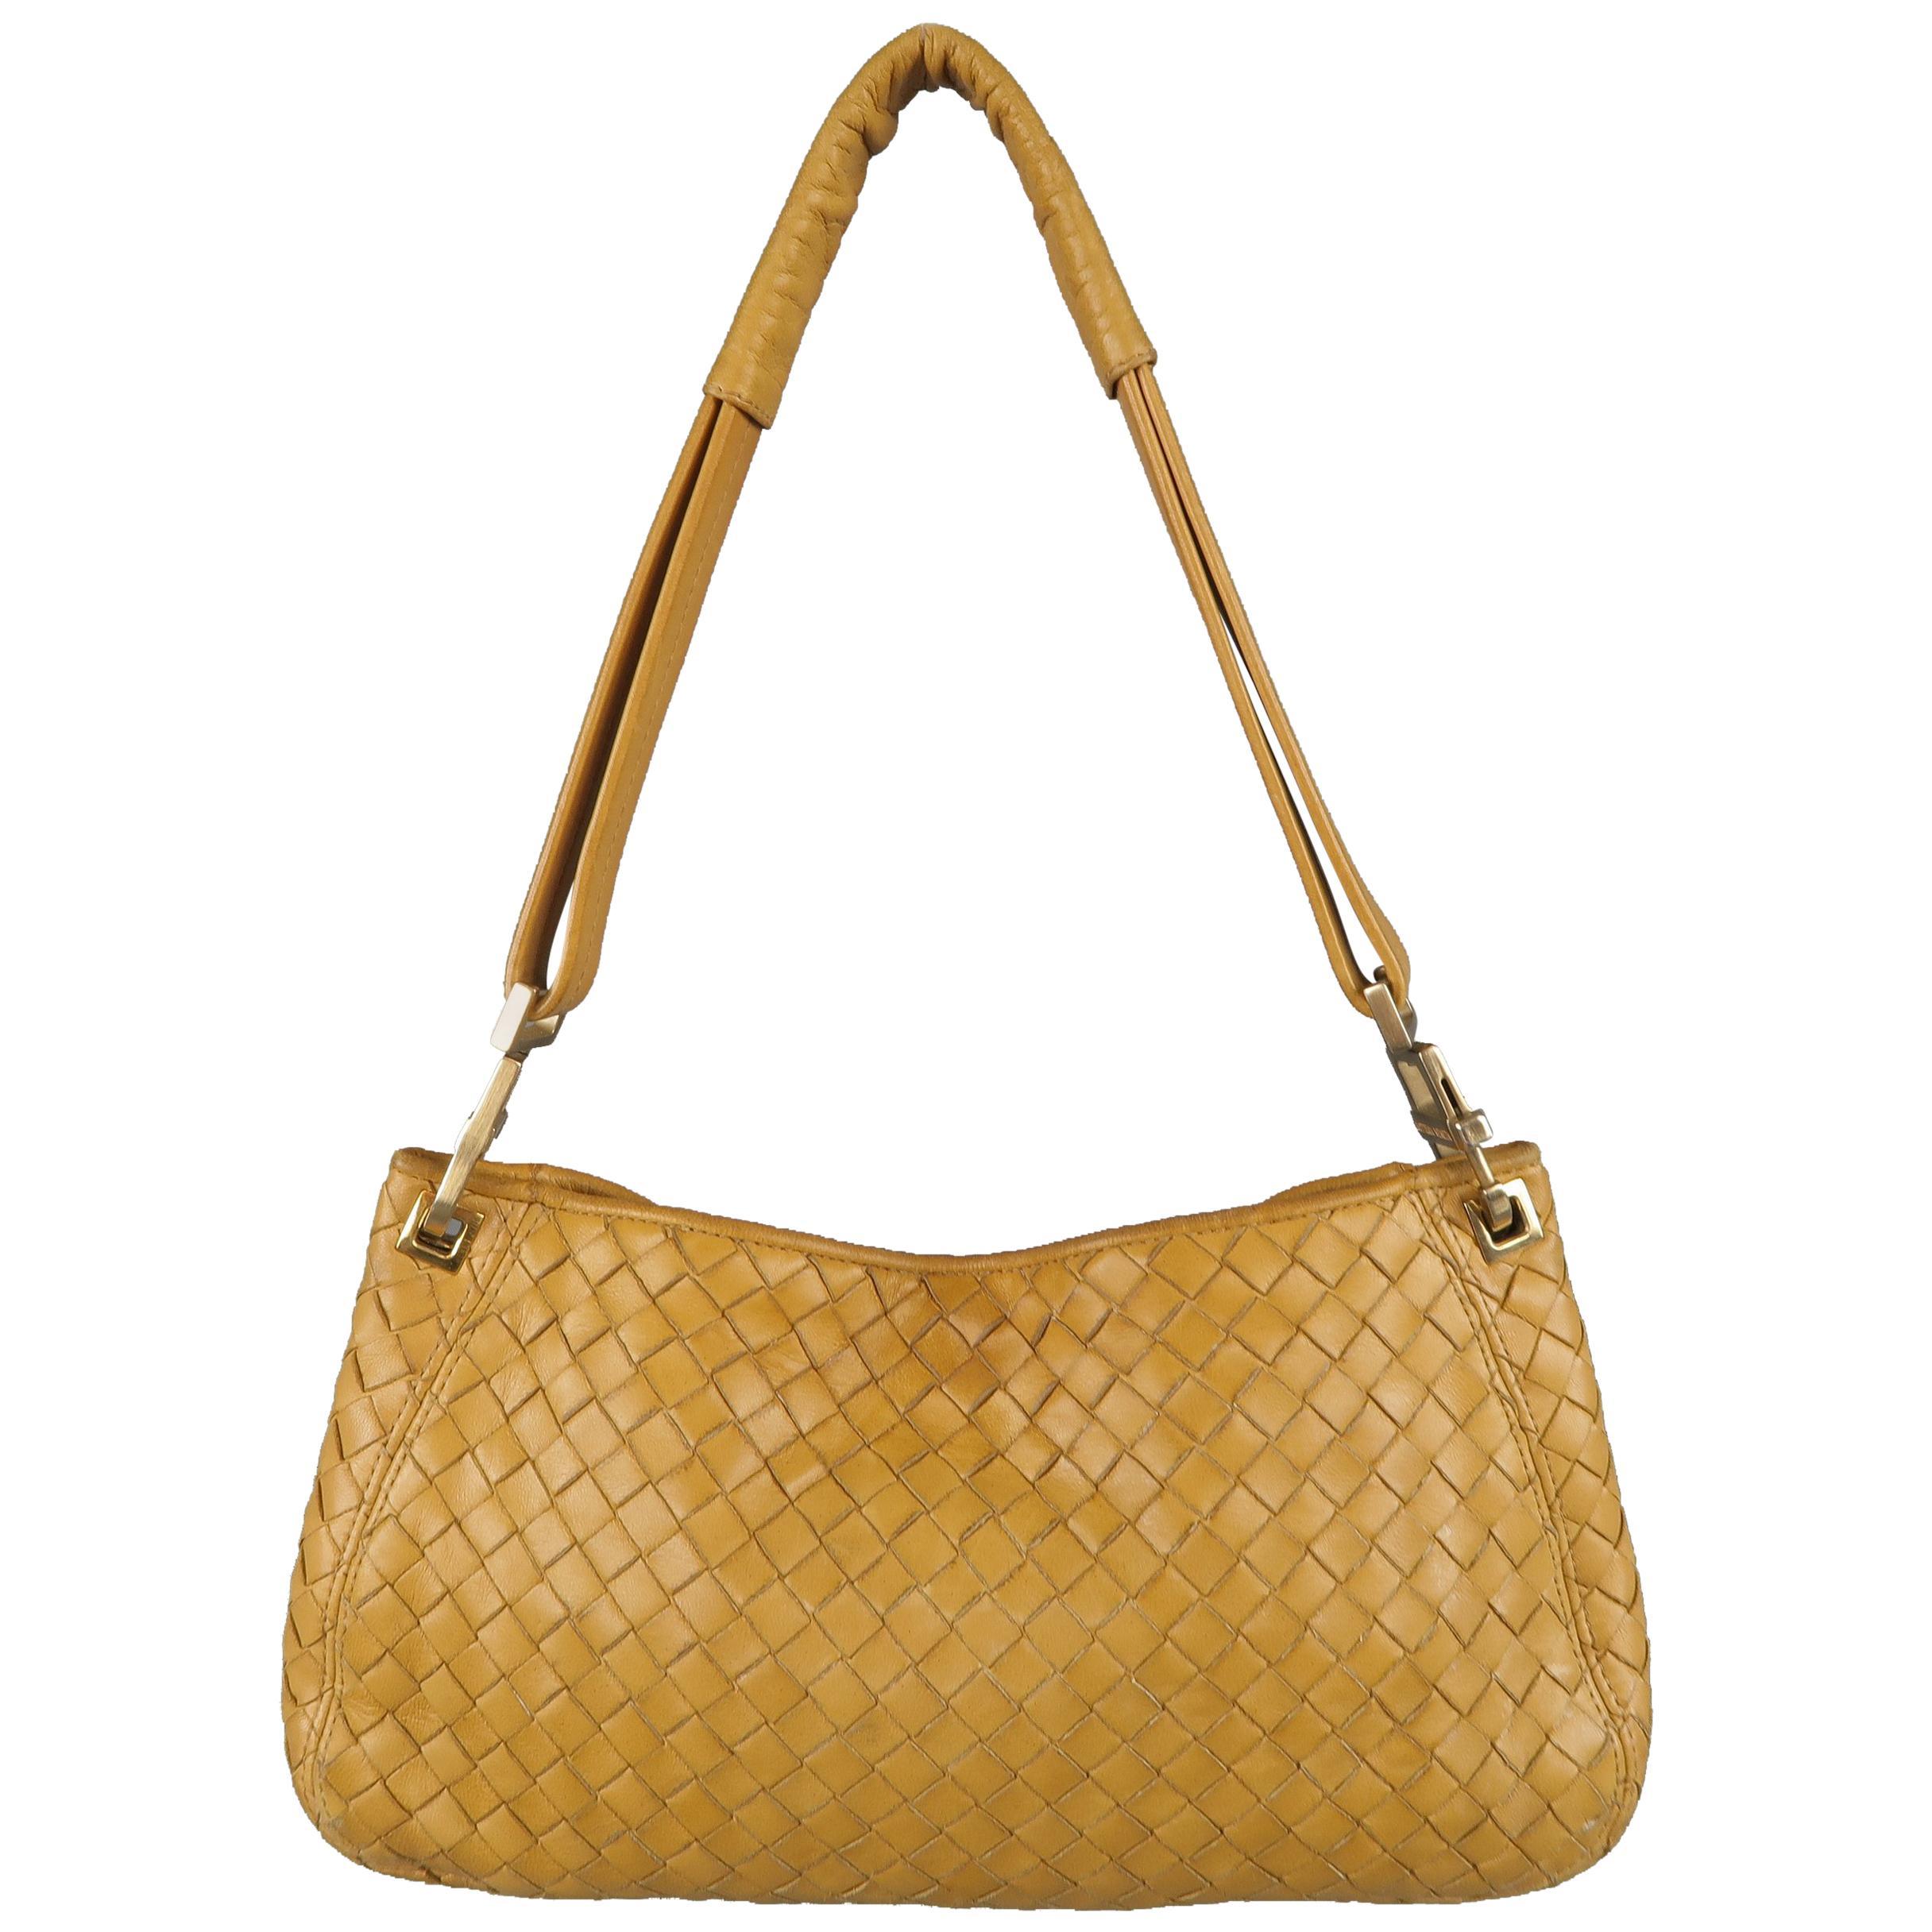 18f90b7551 BOTTEGA VENETA Yellow Gold Intrecciato Leather Shoulder Bag